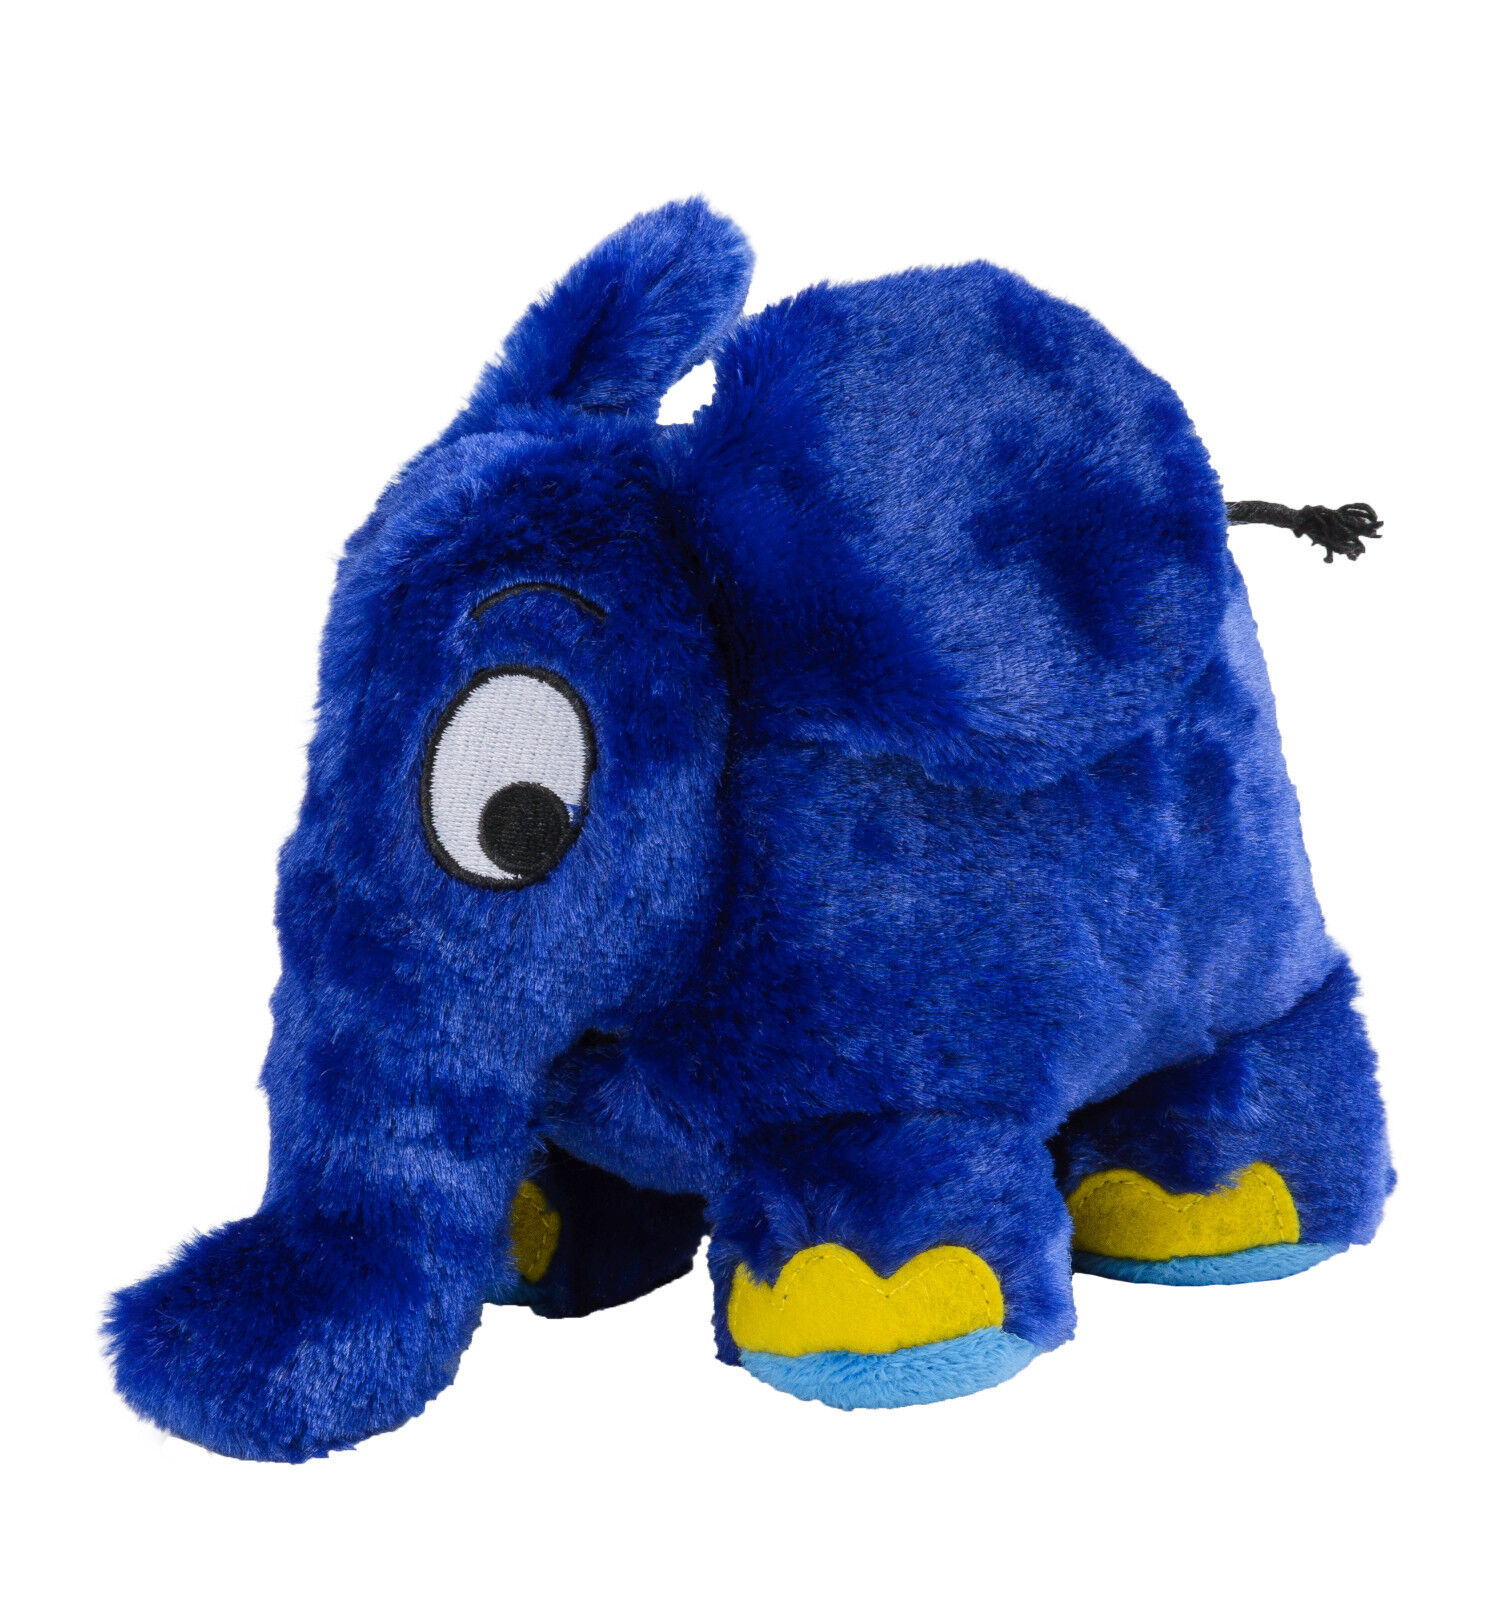 Original Warmies Greenlife Wärmestofftier Wärmekissen Körnerkissen Wärmetier NEU Der Blaue Elefant